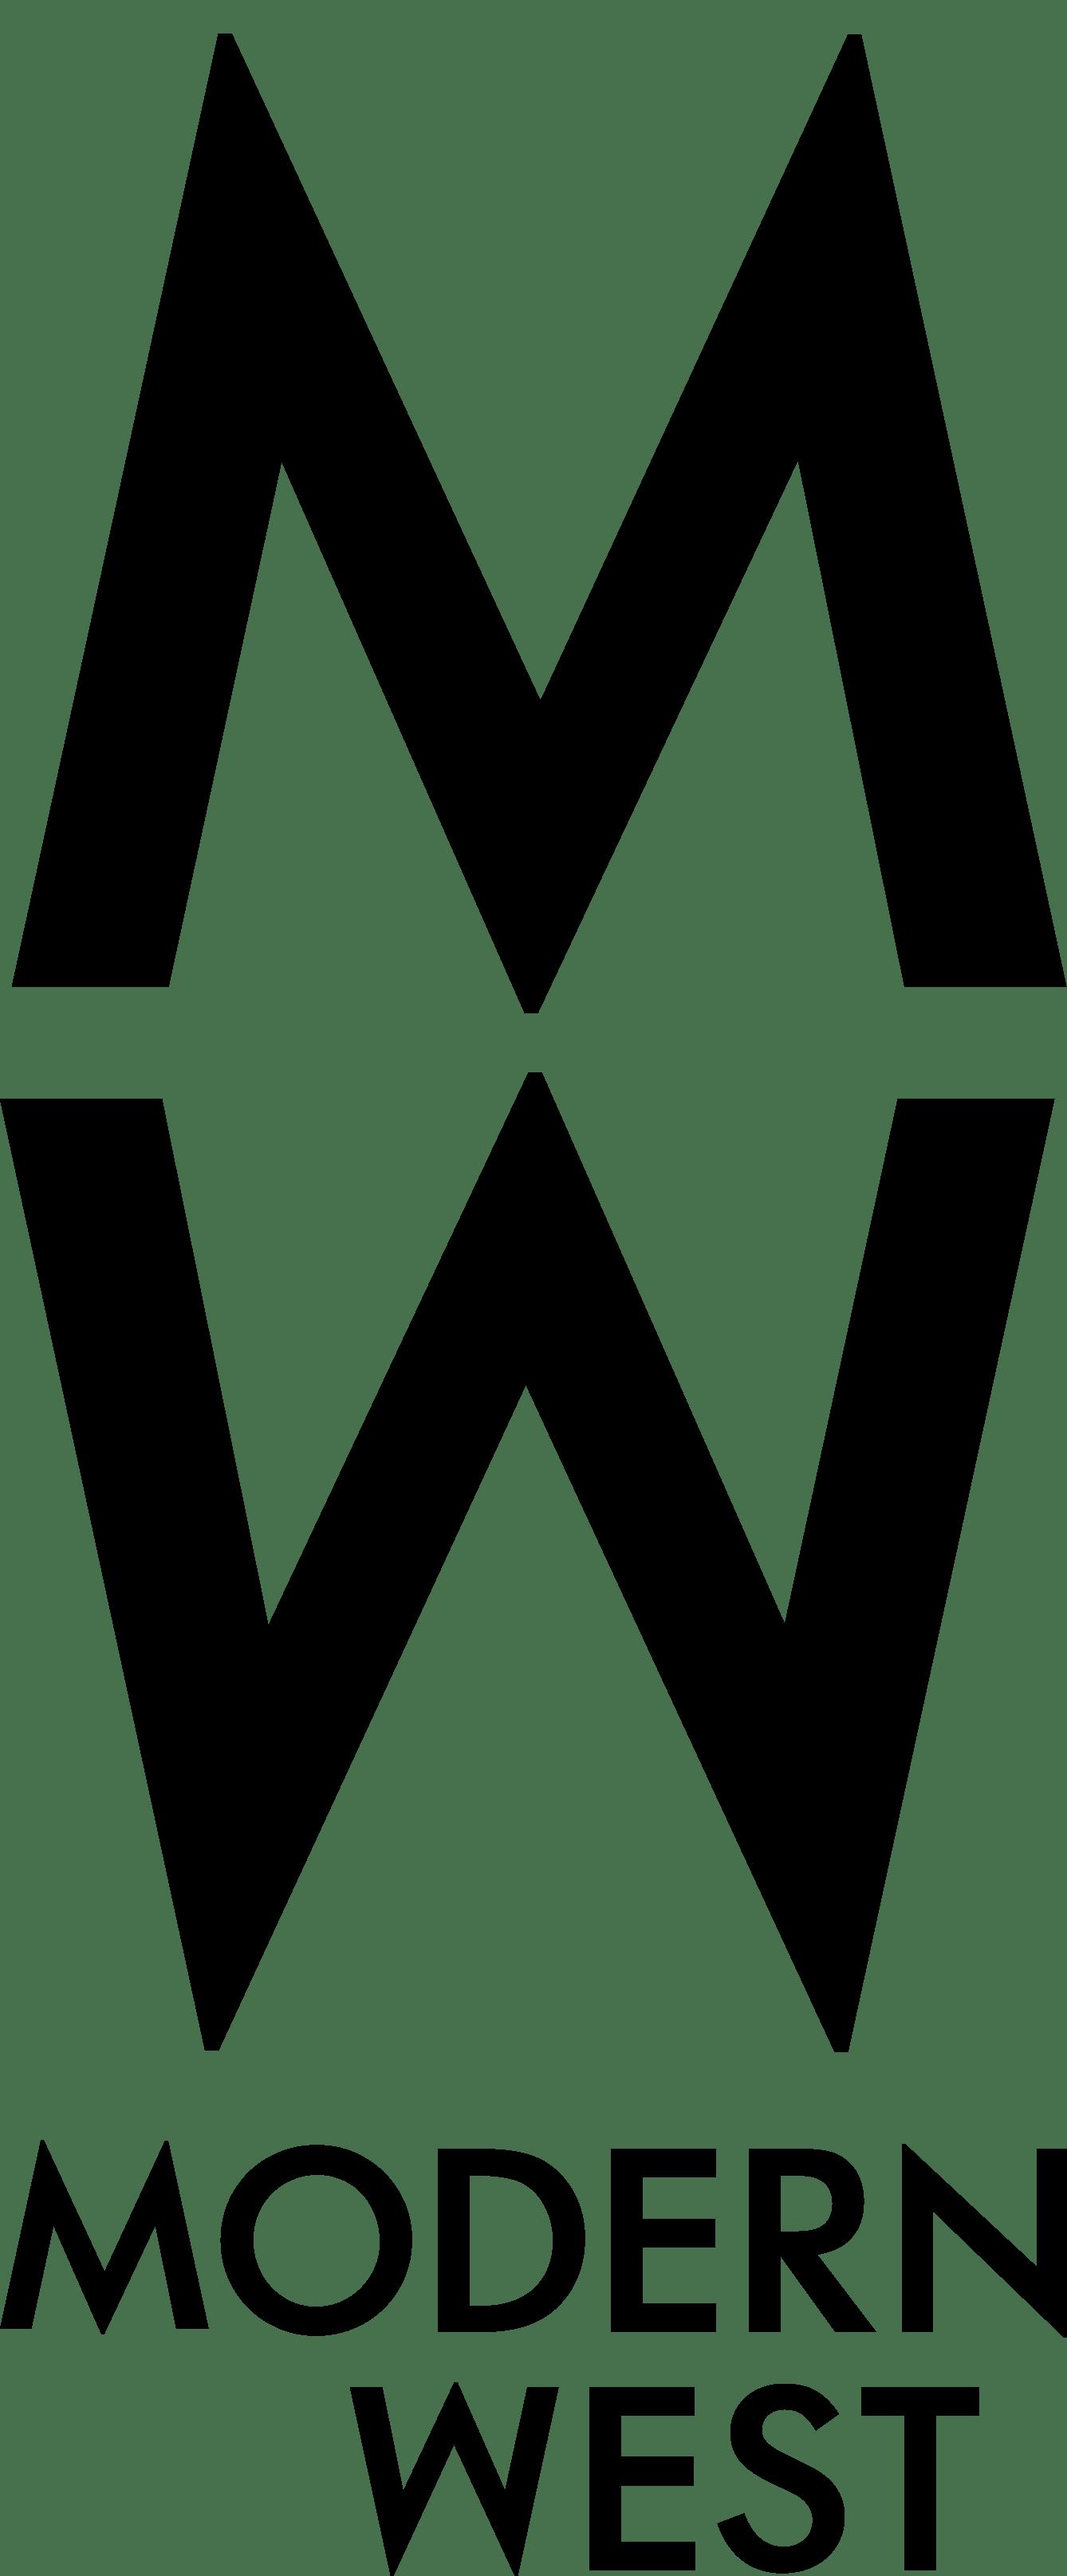 Modern West company logo